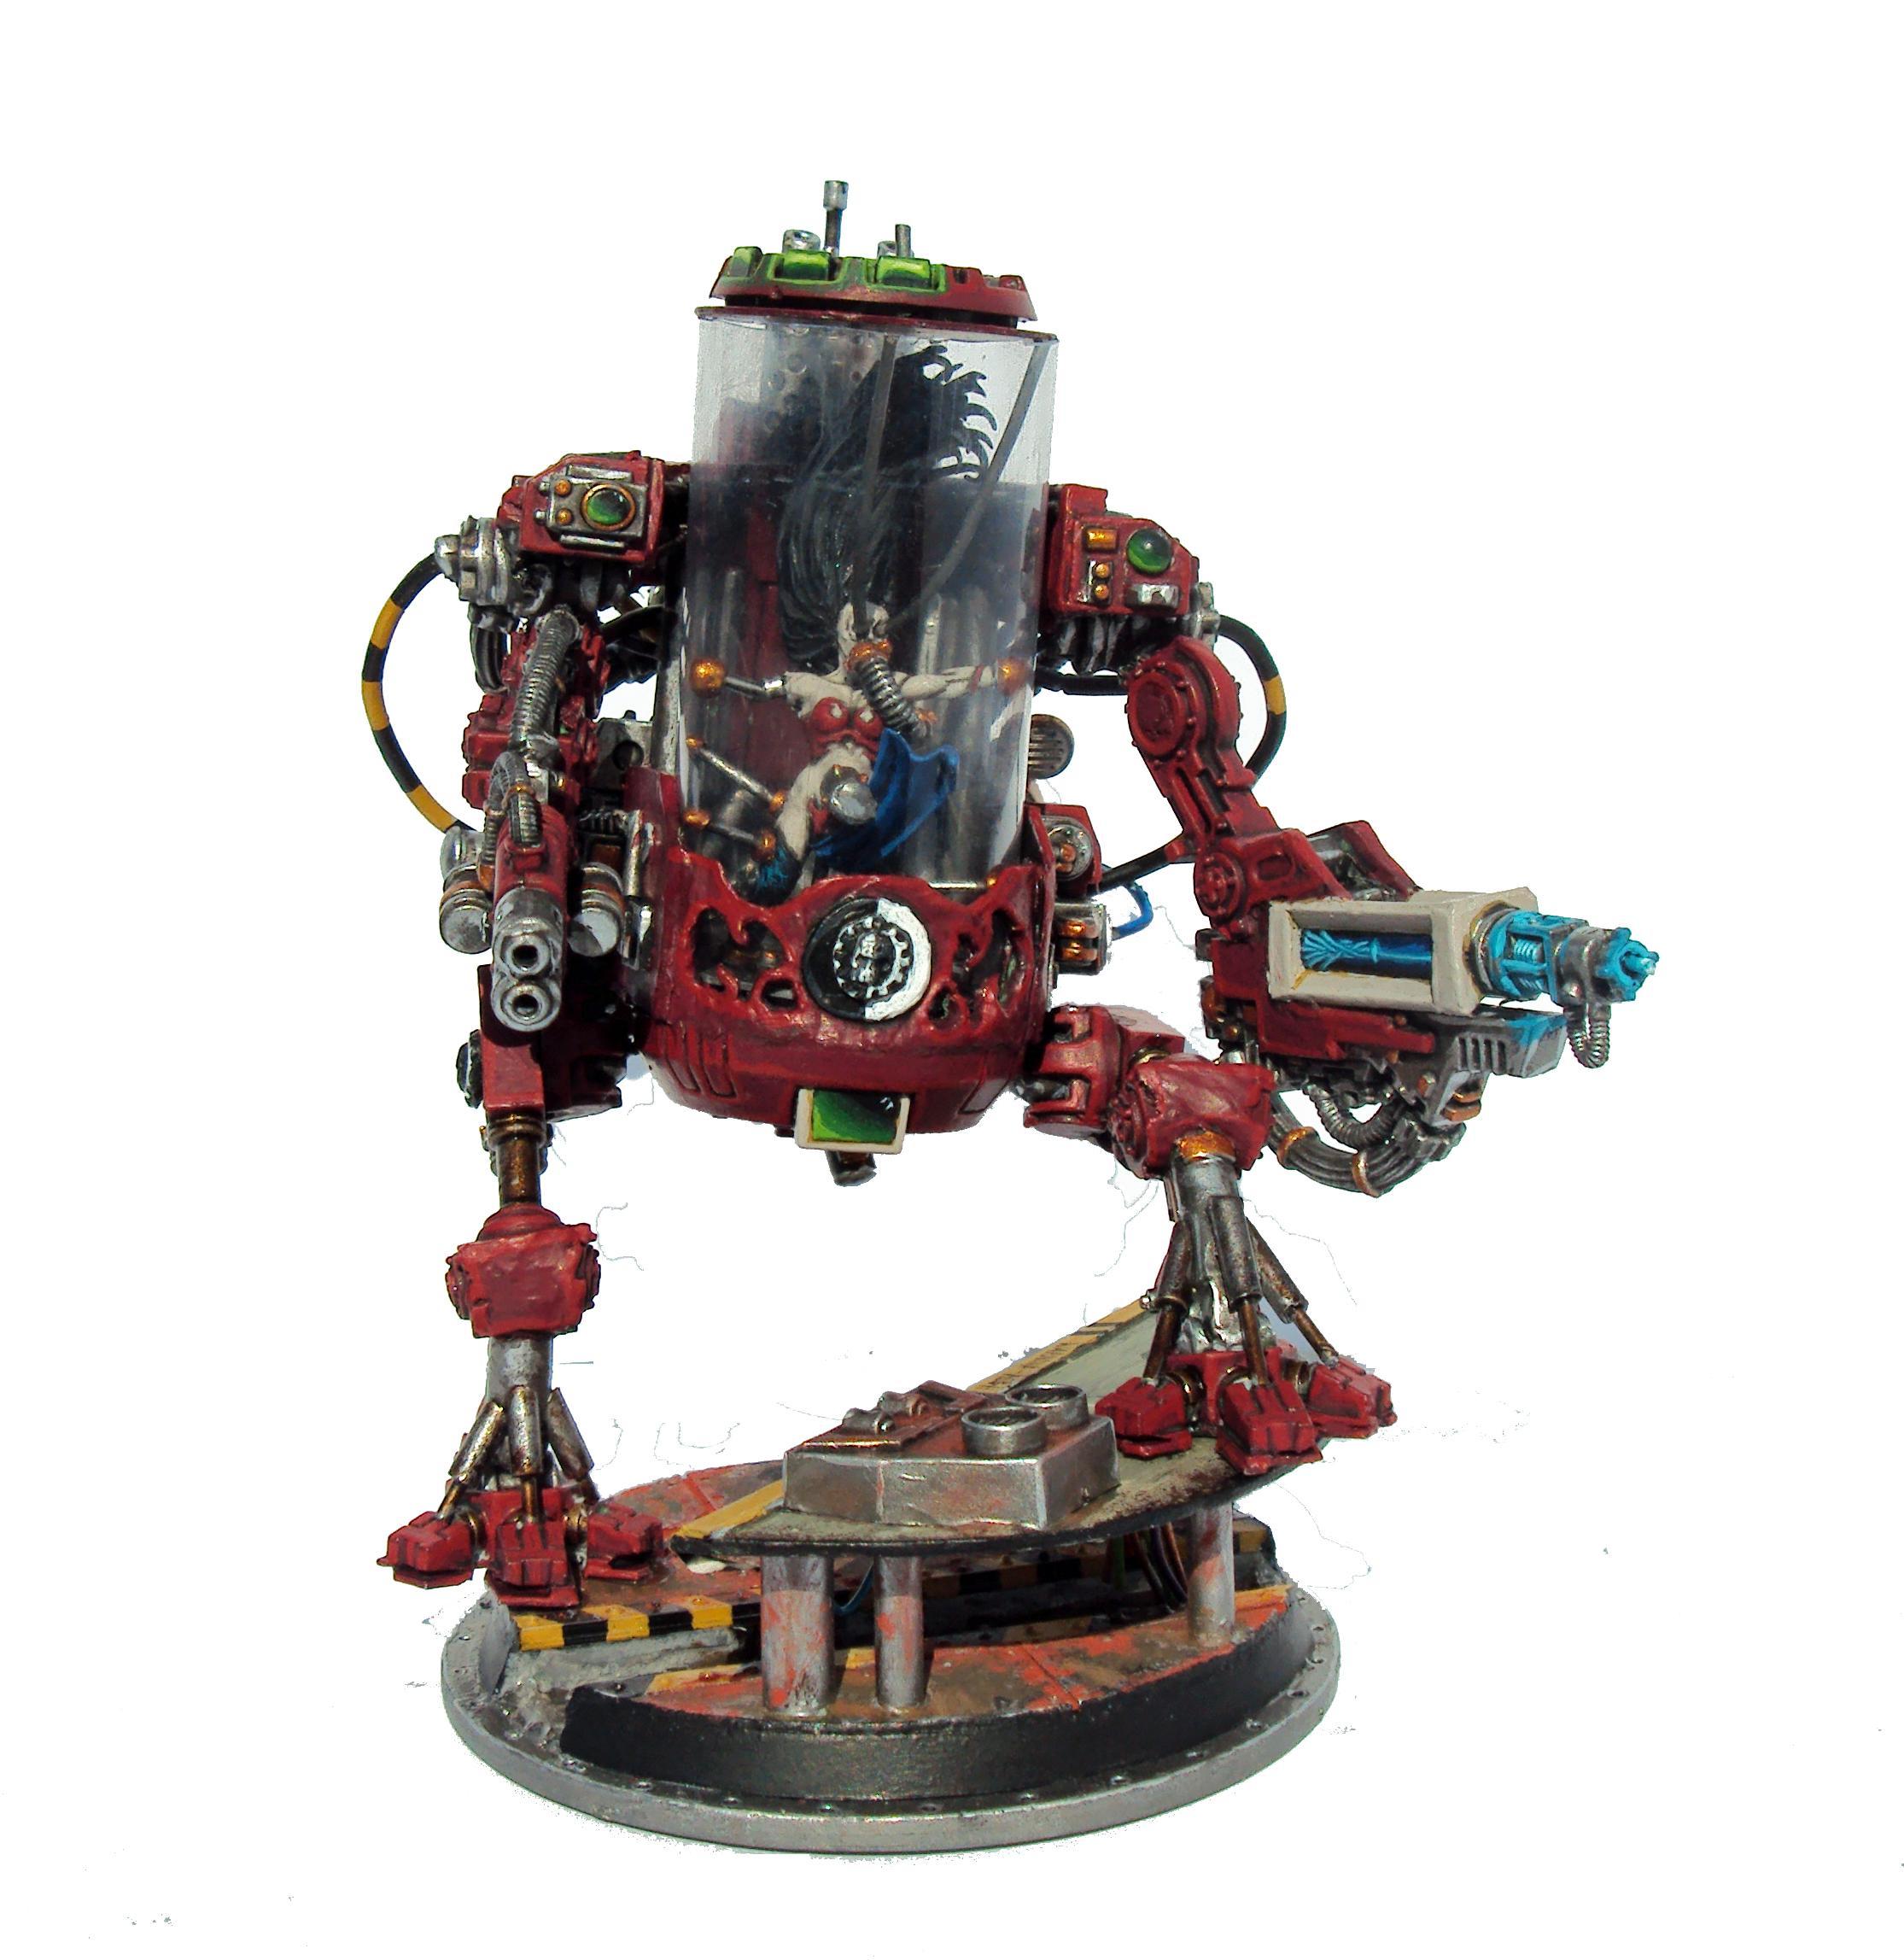 Adeptus Mechanicus, Archmagos Veneratus, Pimp My Wizard, Warhammer 40,000